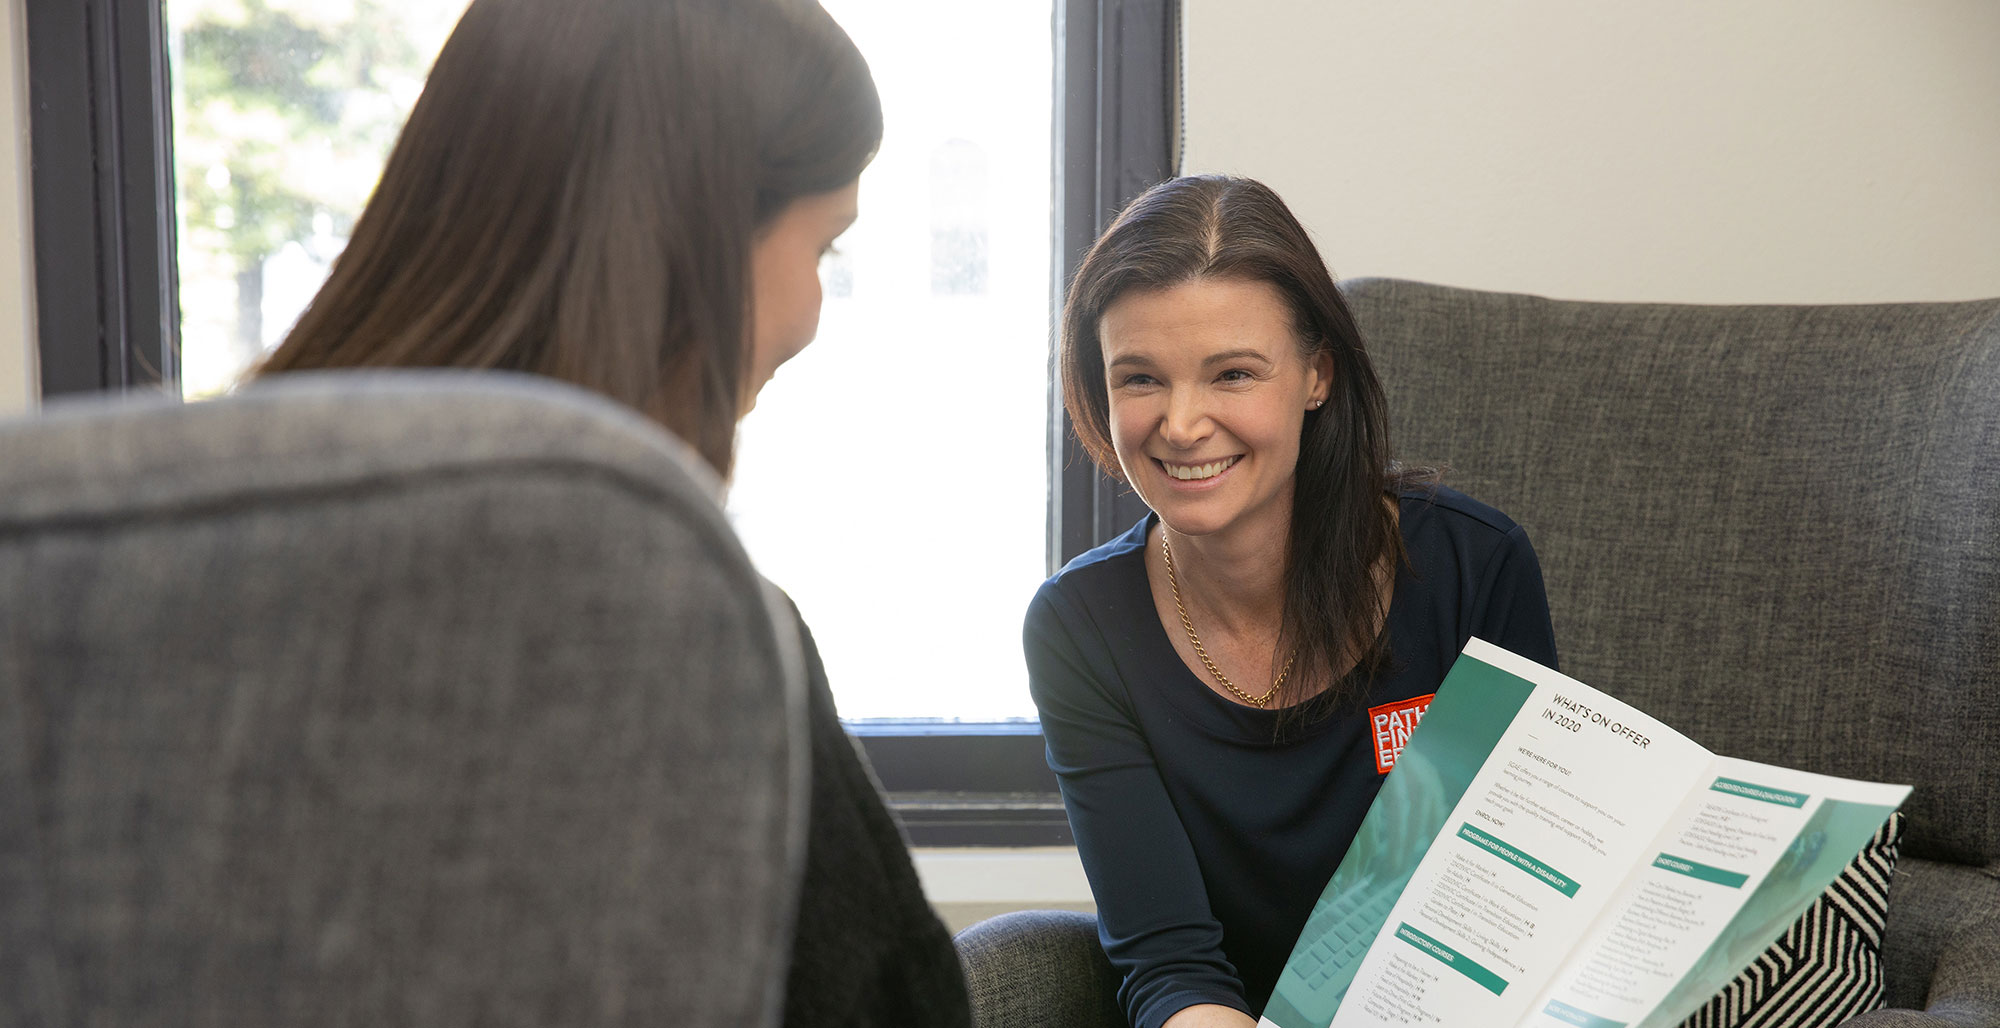 SJC staff meeting client